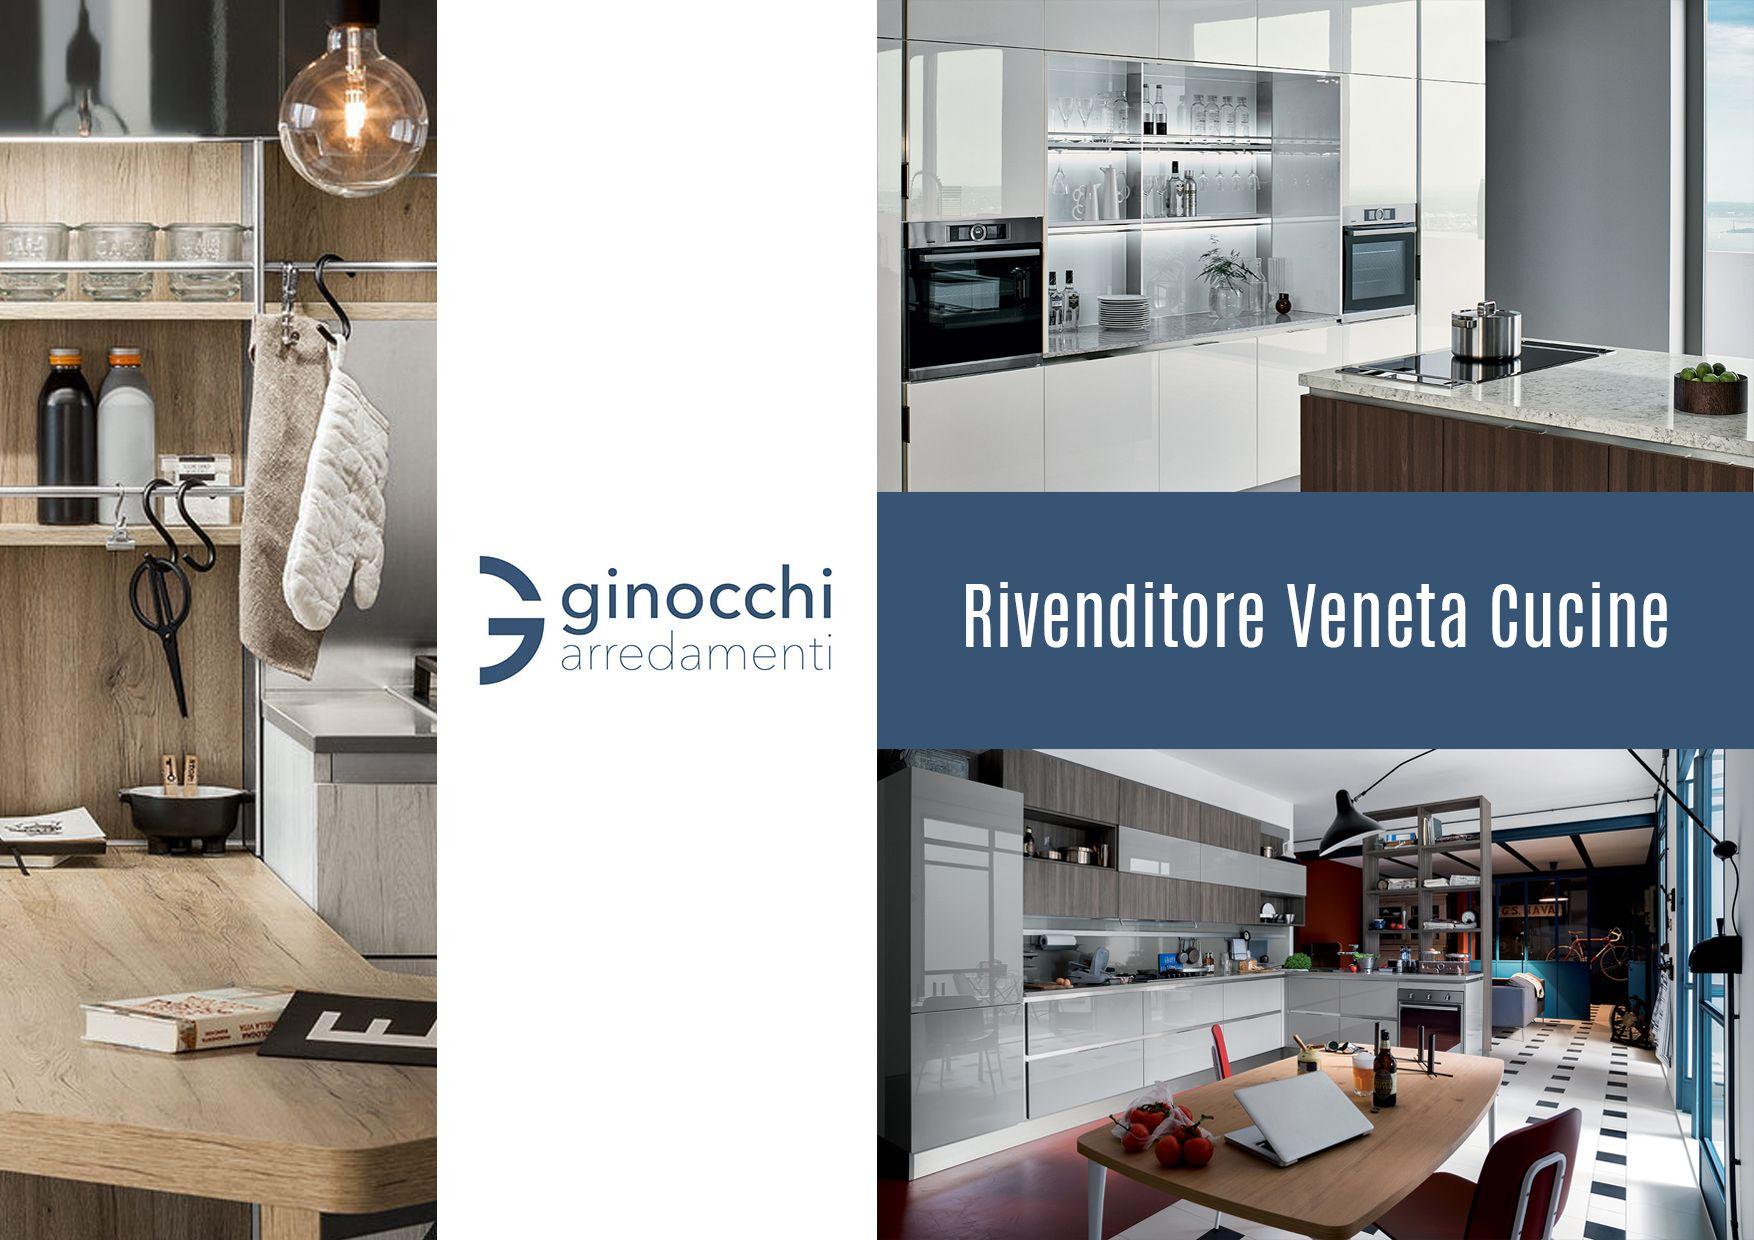 Ginocchi Arredamenti Rivenditore Veneta Cucine   Rivenditore ...